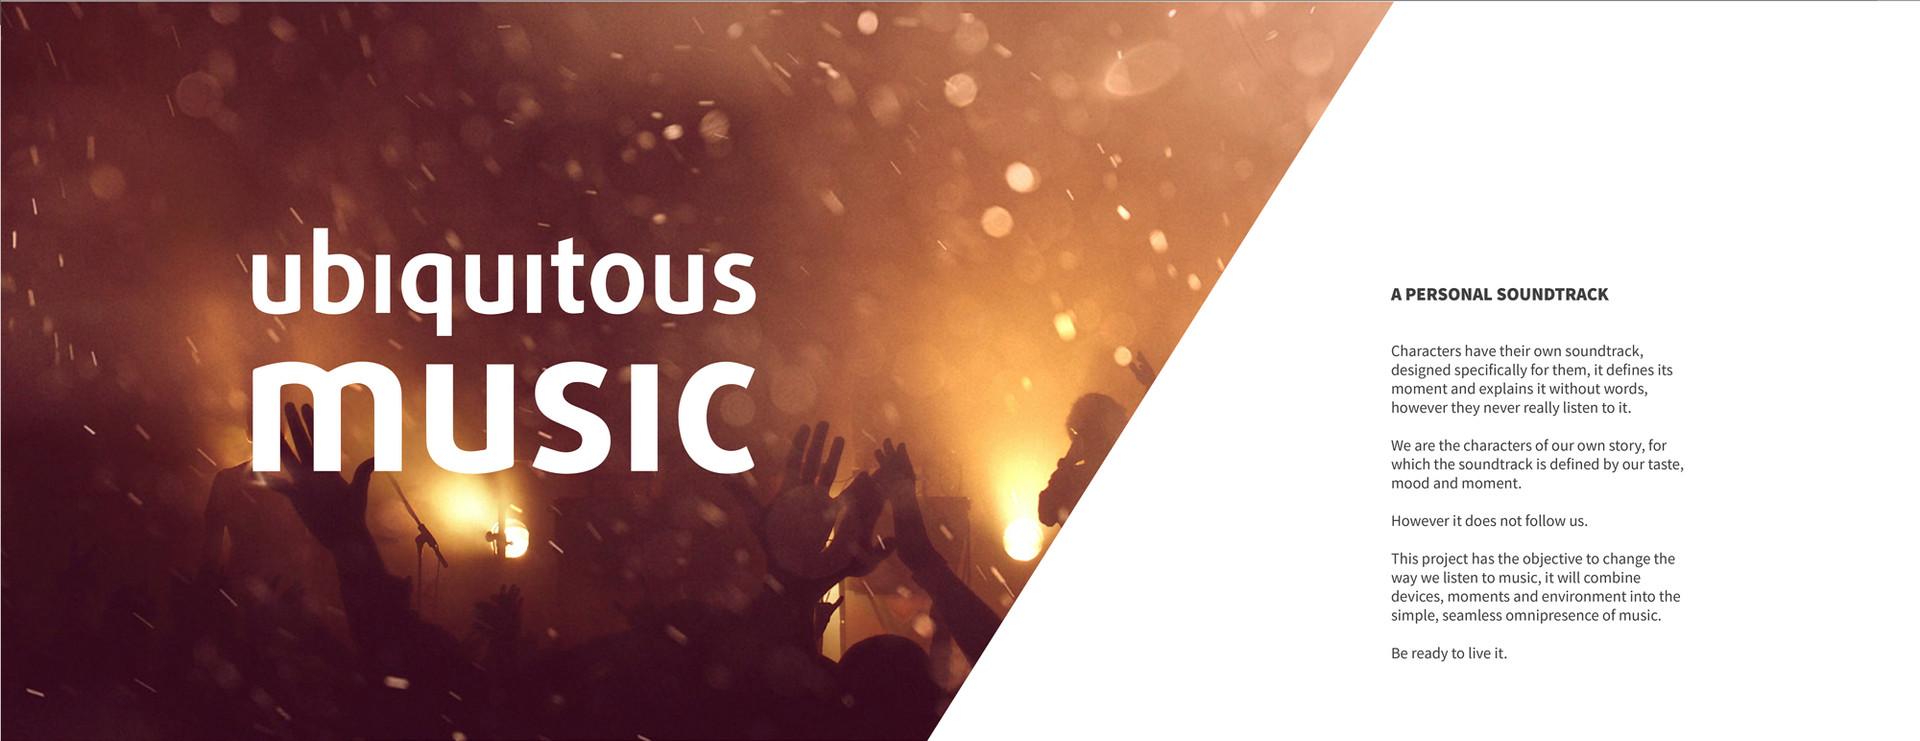 SoundtrackWebsite-02.jpg